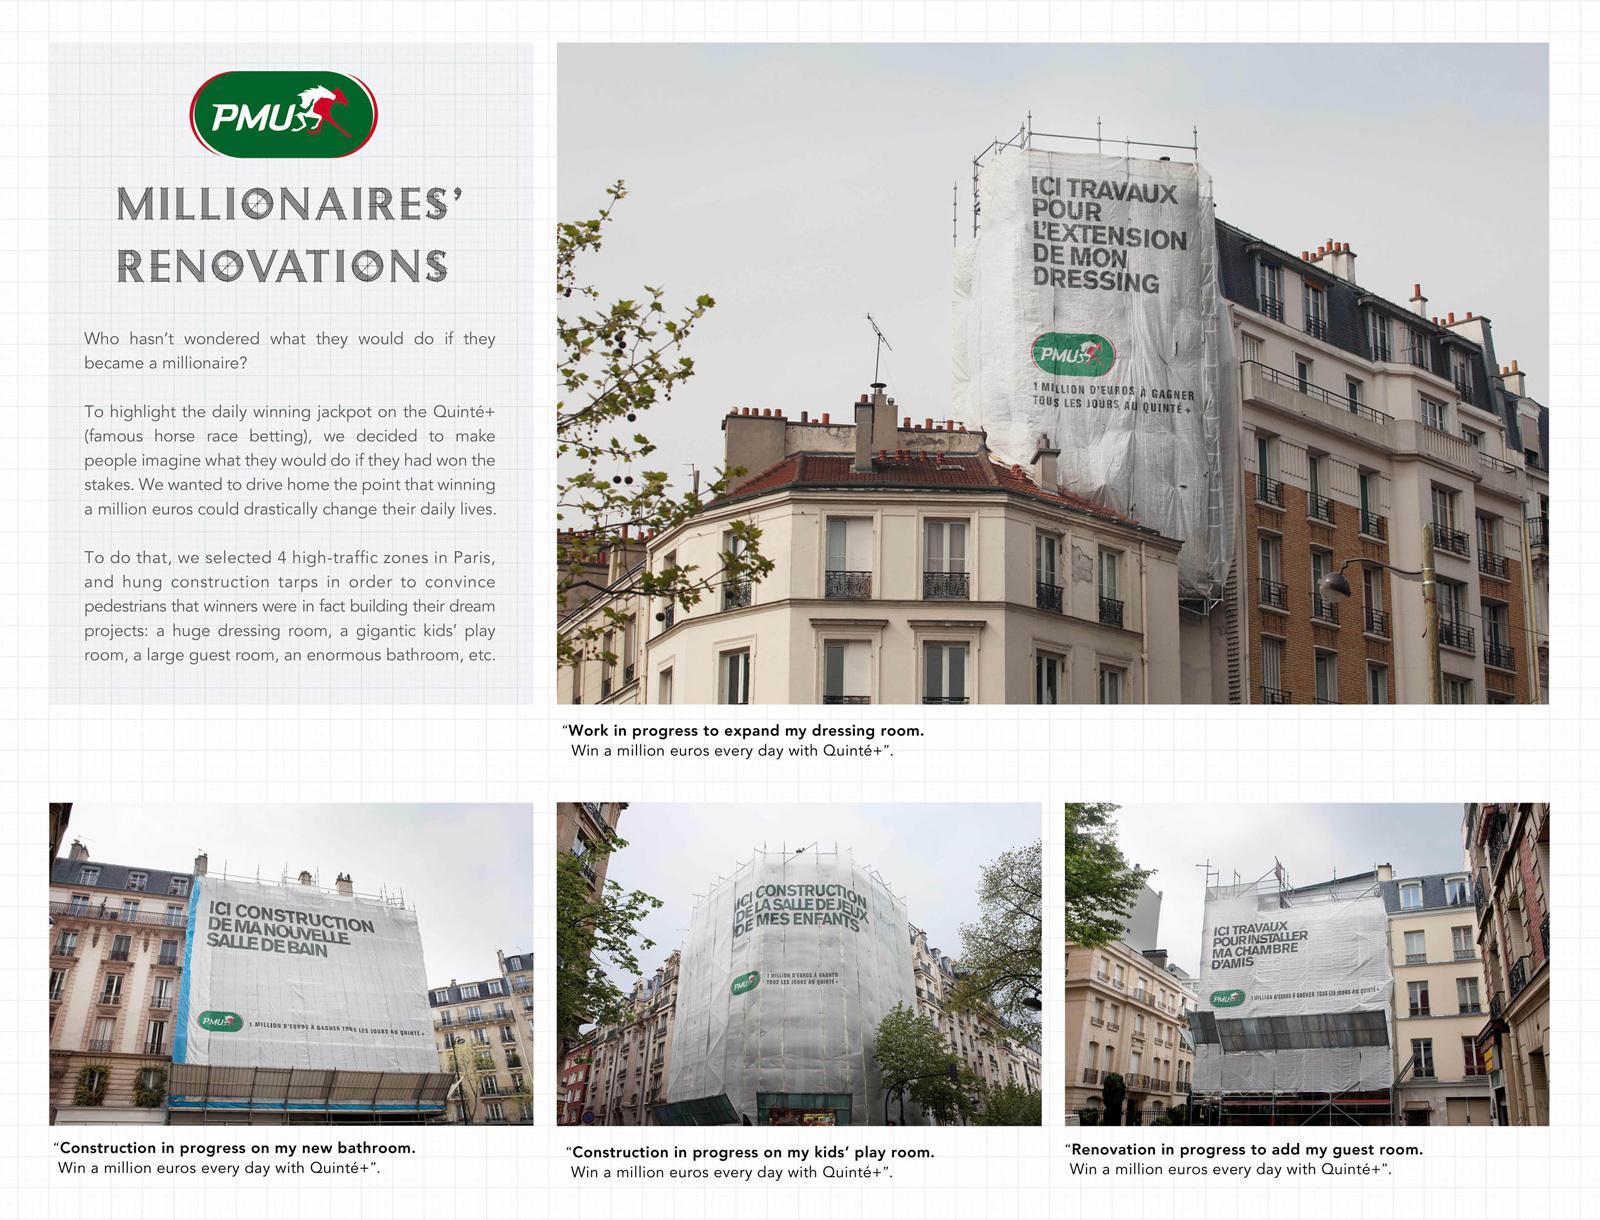 PMU Outdoor Ad -  Millionnaires' Renovations